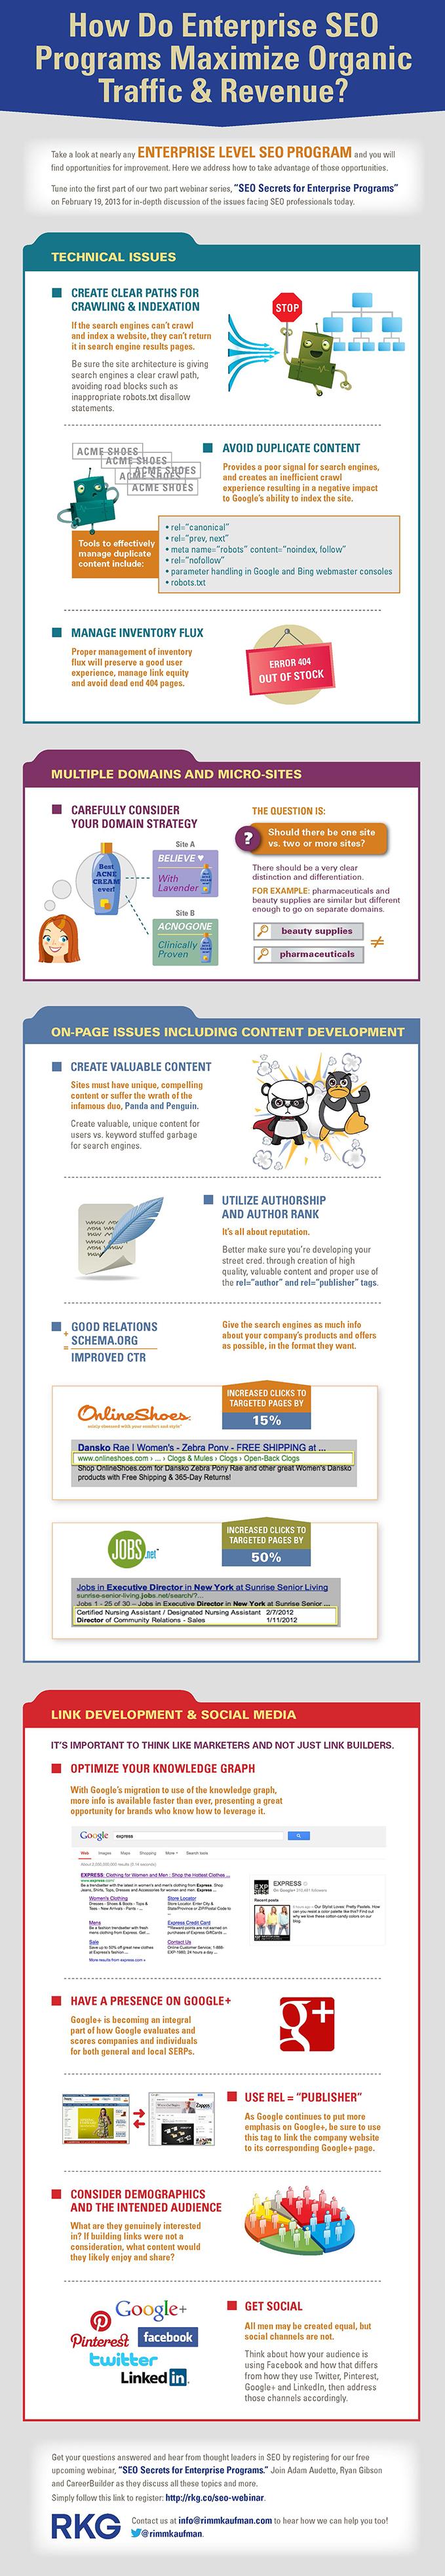 Enterprise SEO infographic